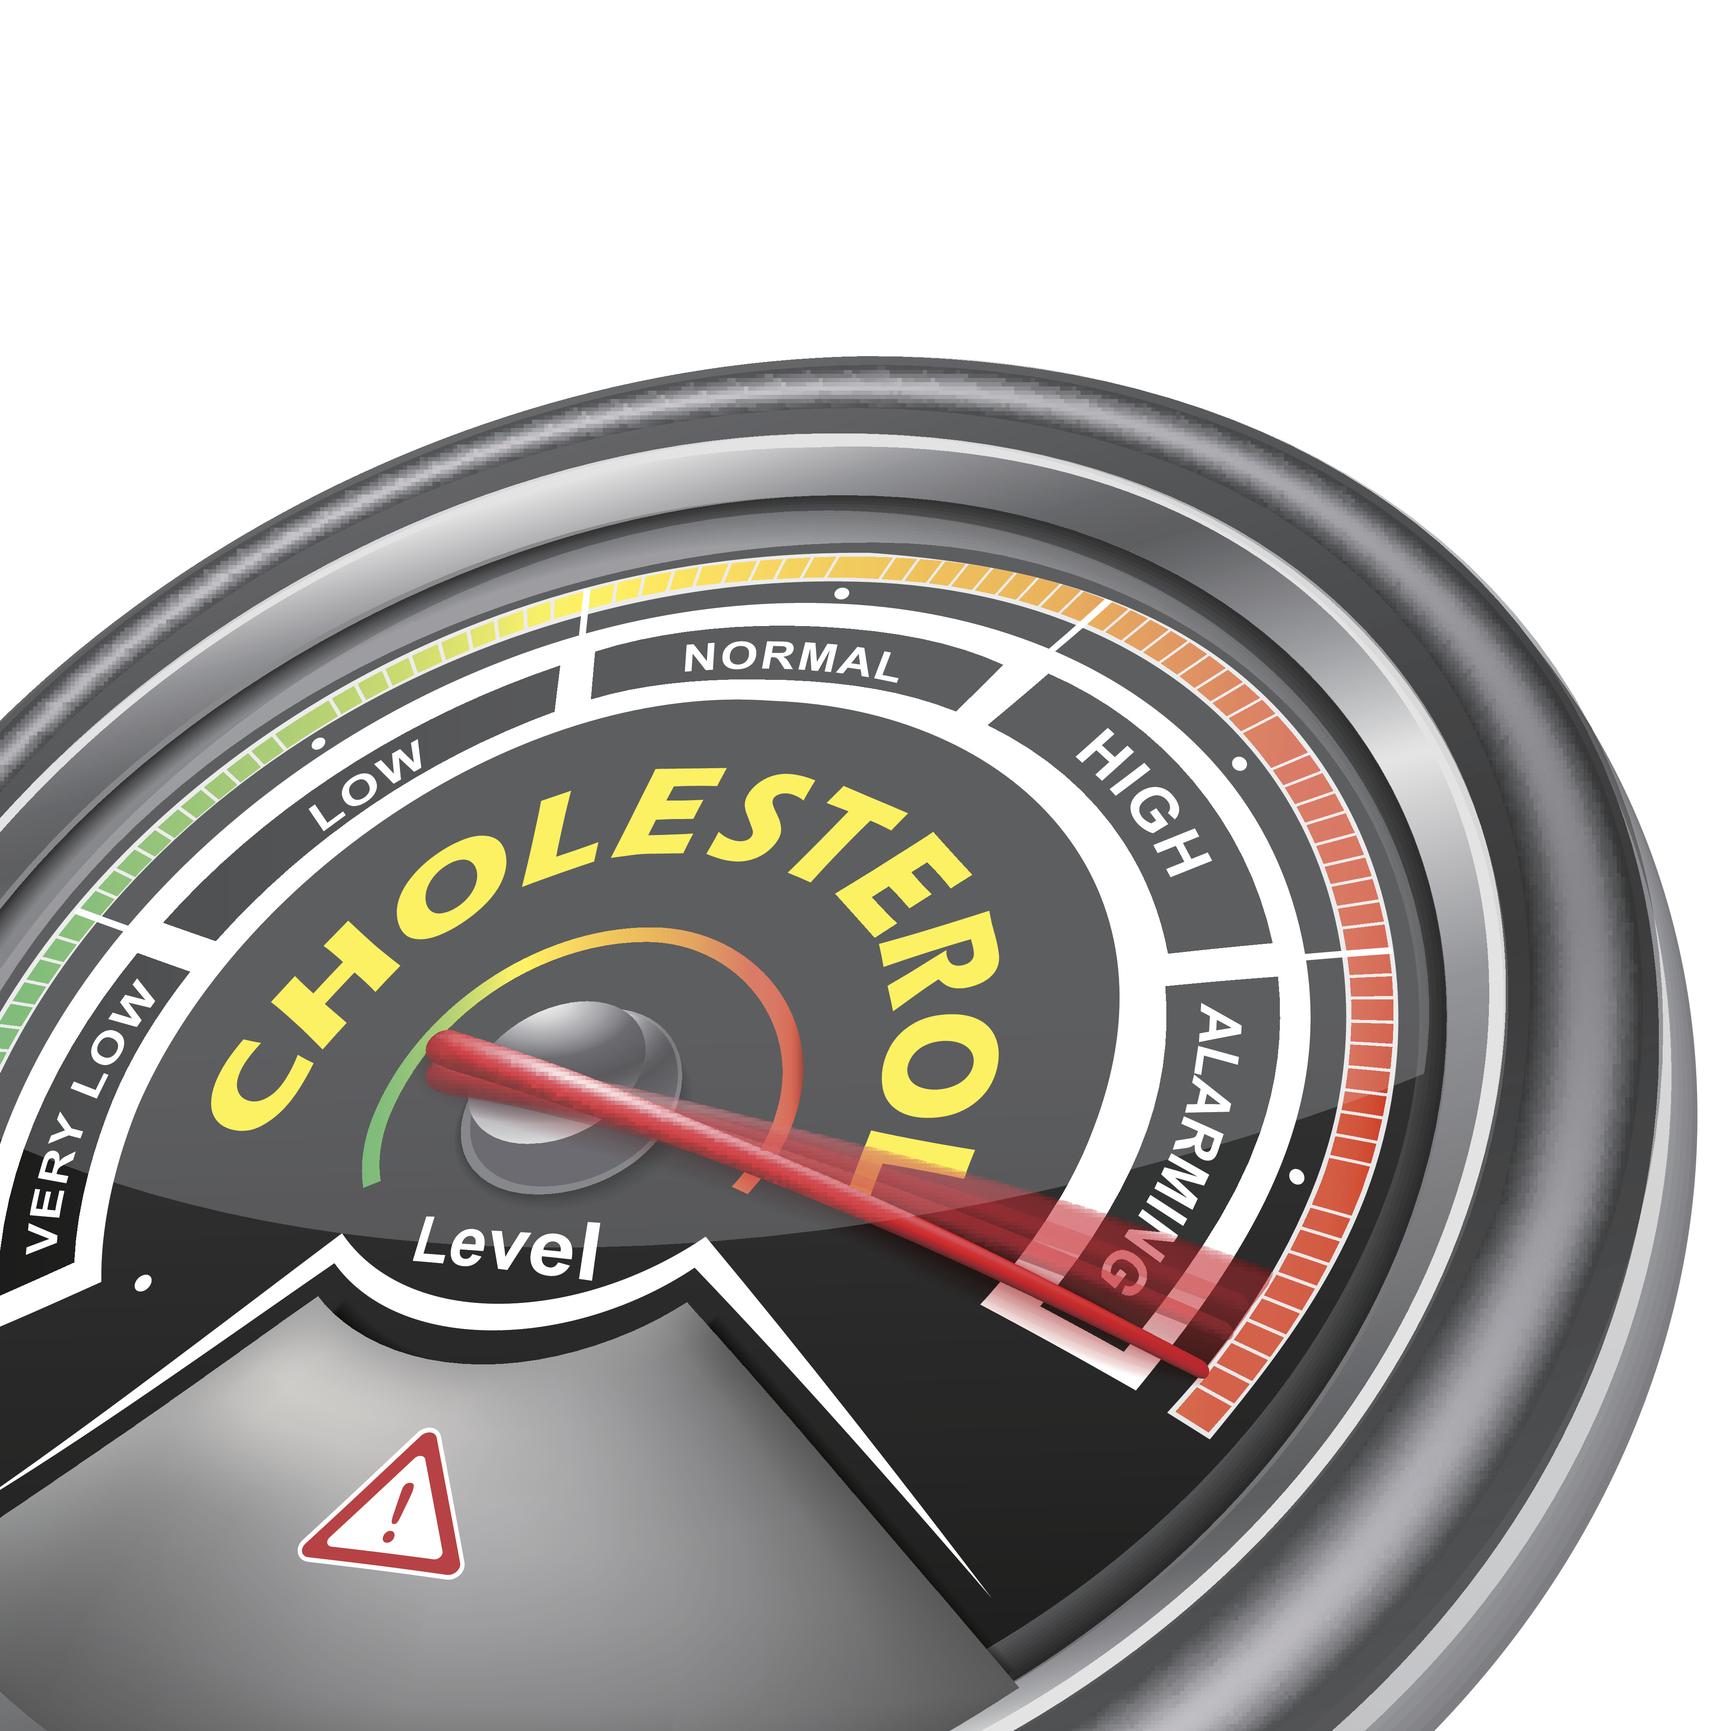 Cholesterol meter measuring the highest setting